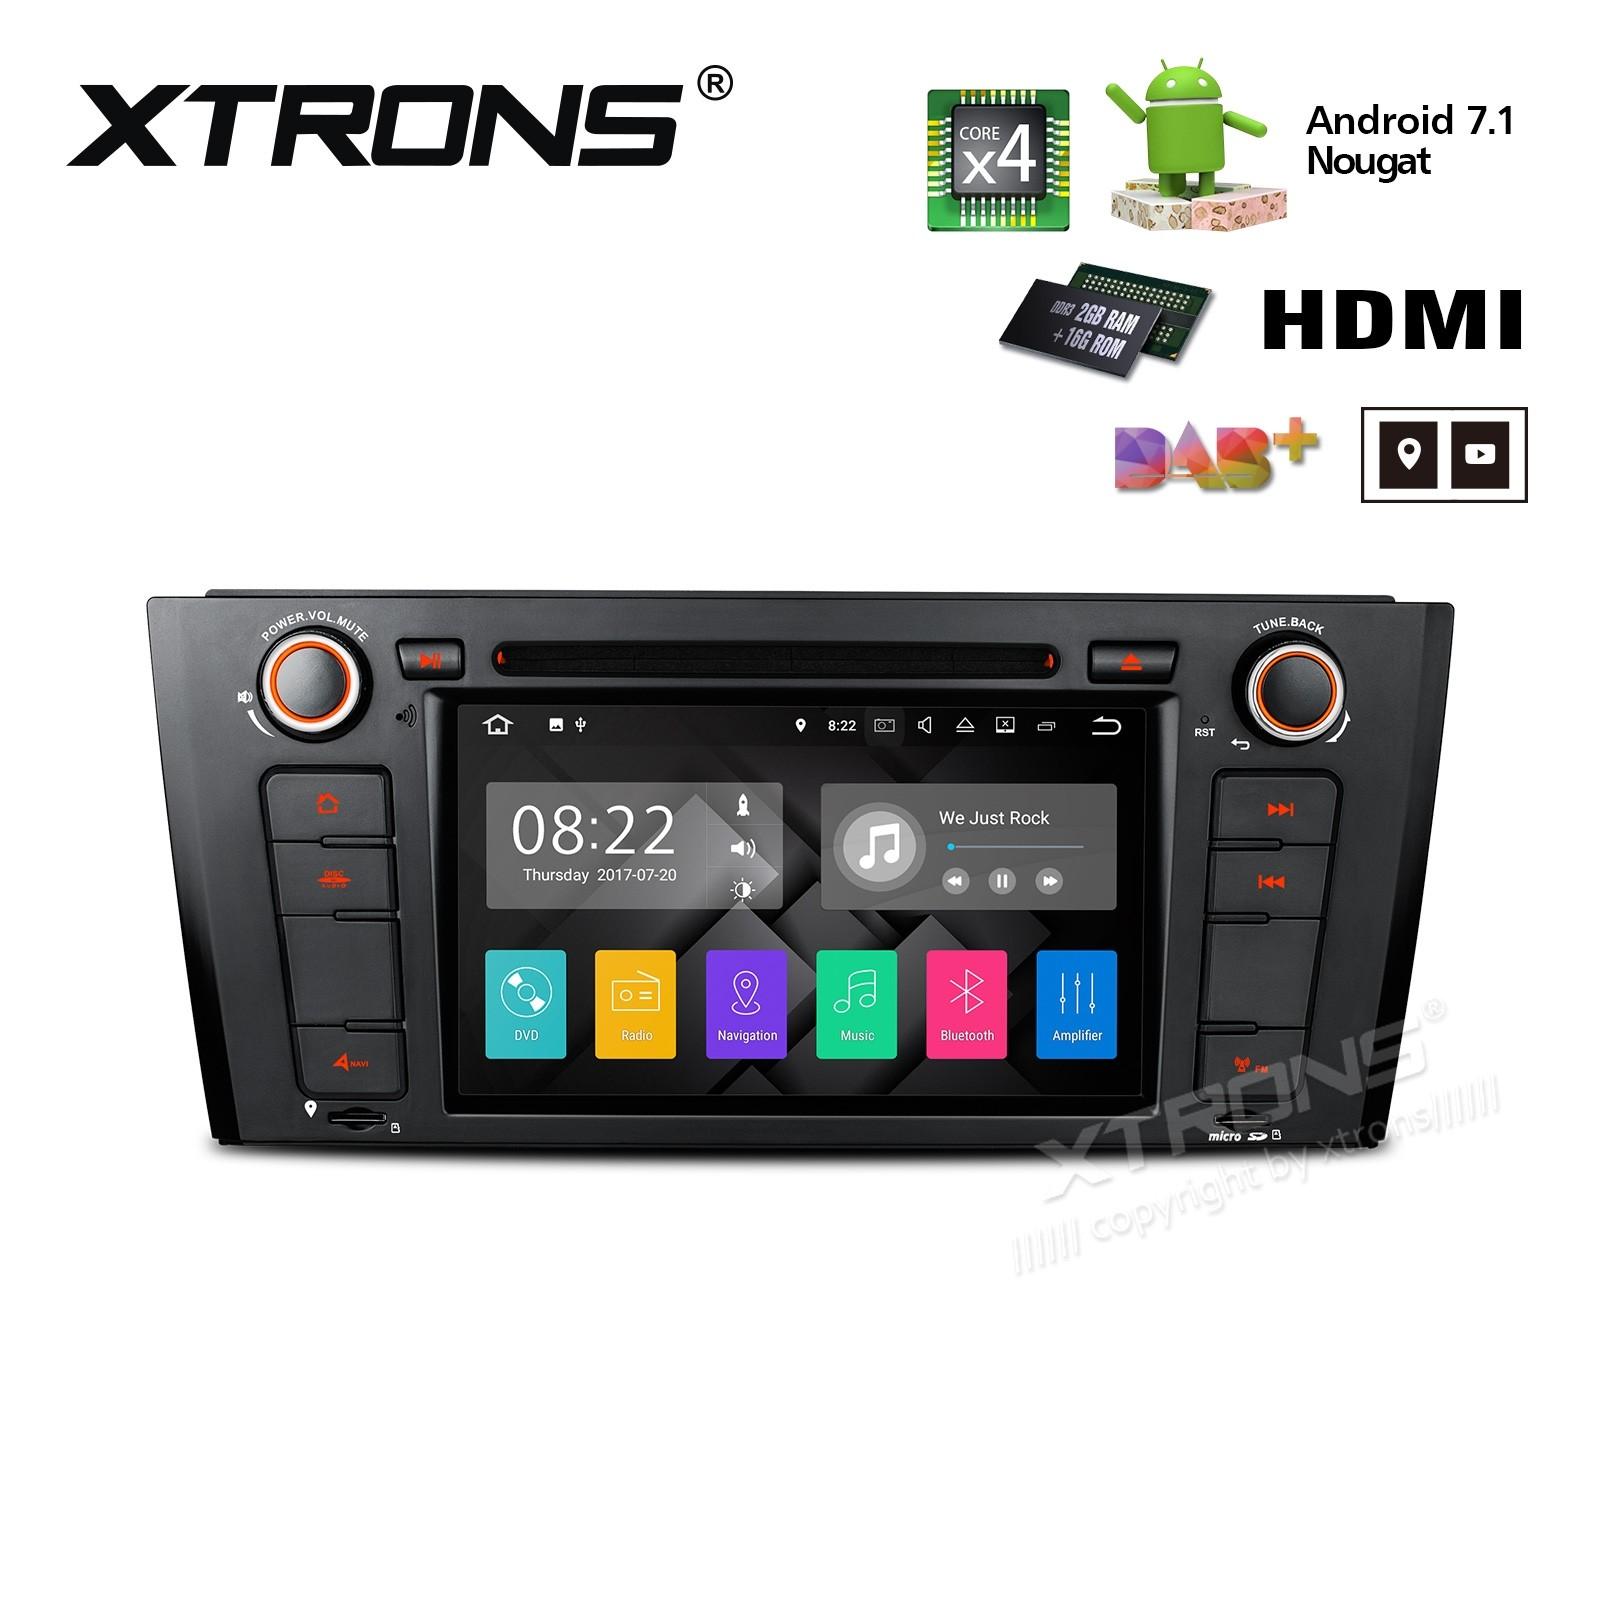 XTRONS PA7781BP